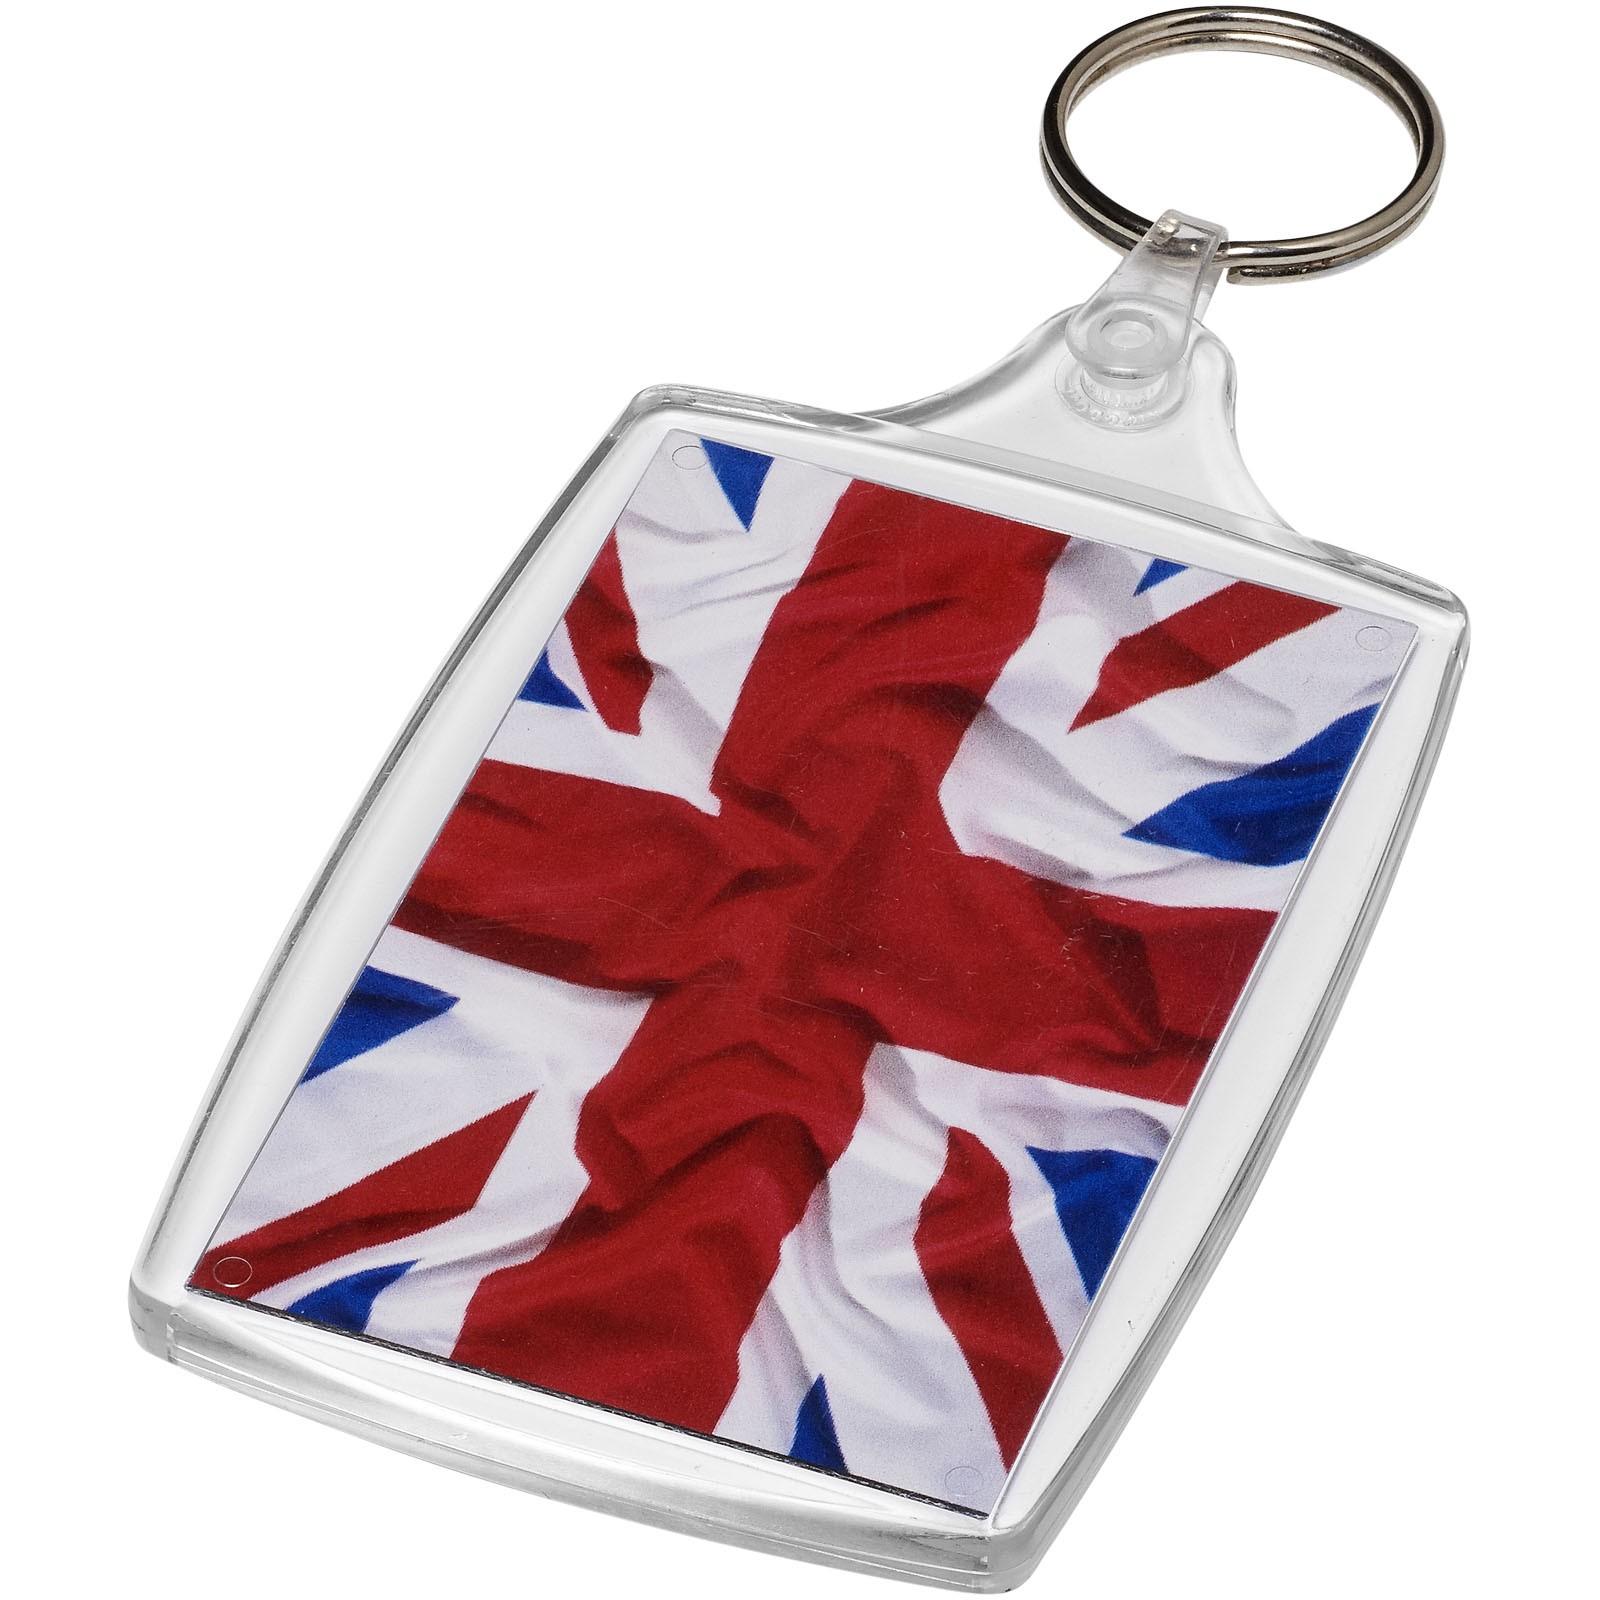 Baiji L6 large keychain with plastic clip